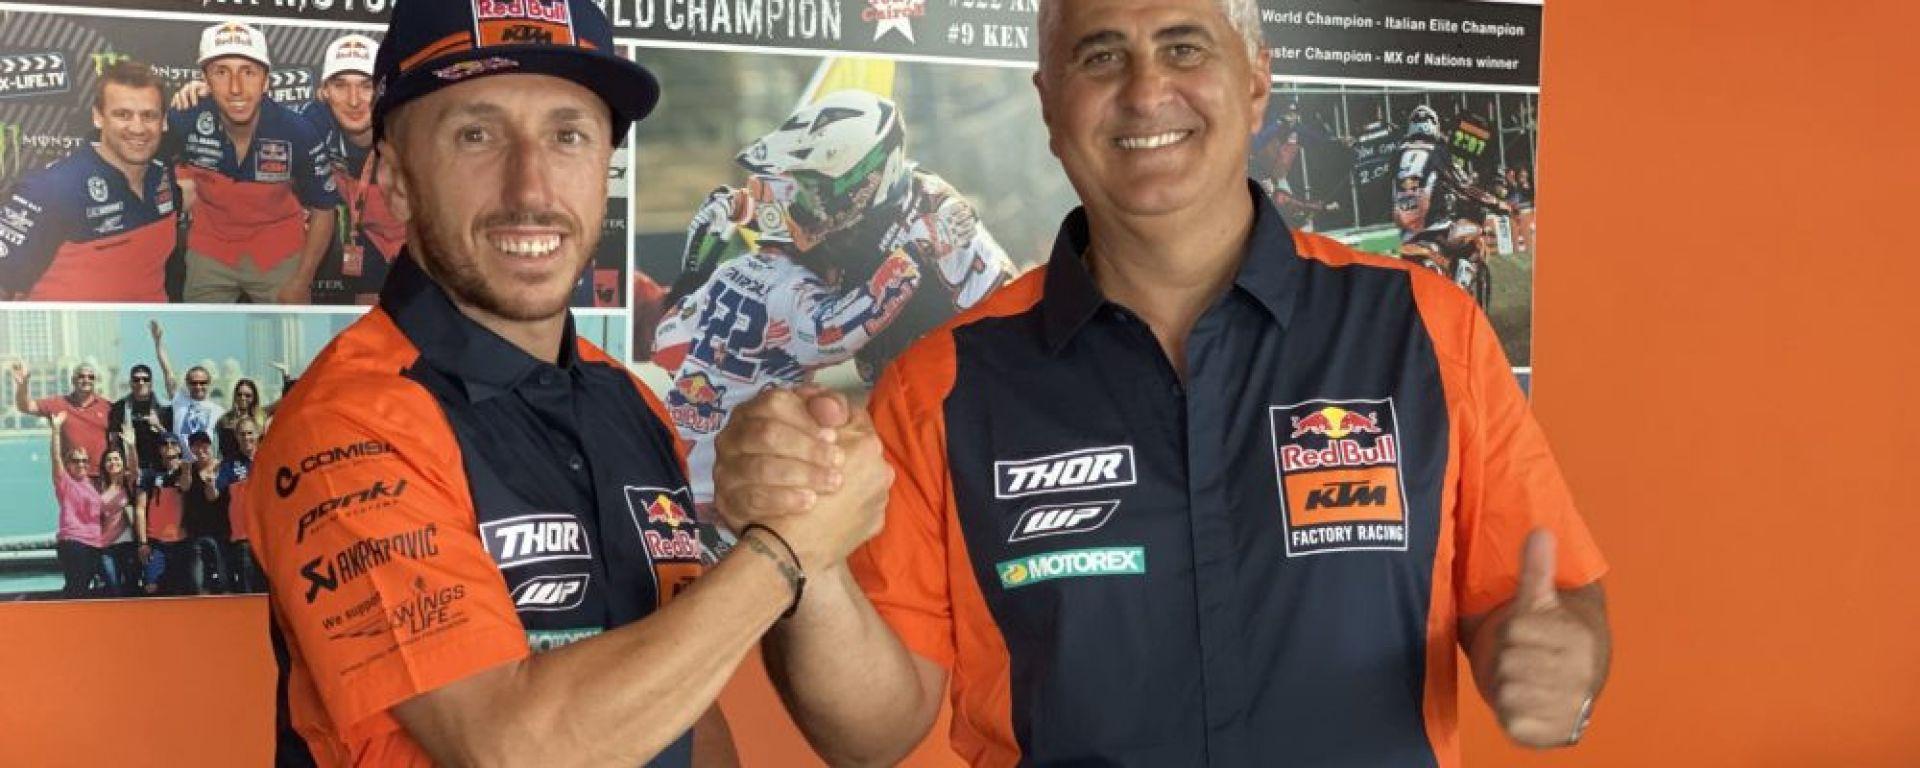 Tony Cairoli e Claudio De Carli (KTM)